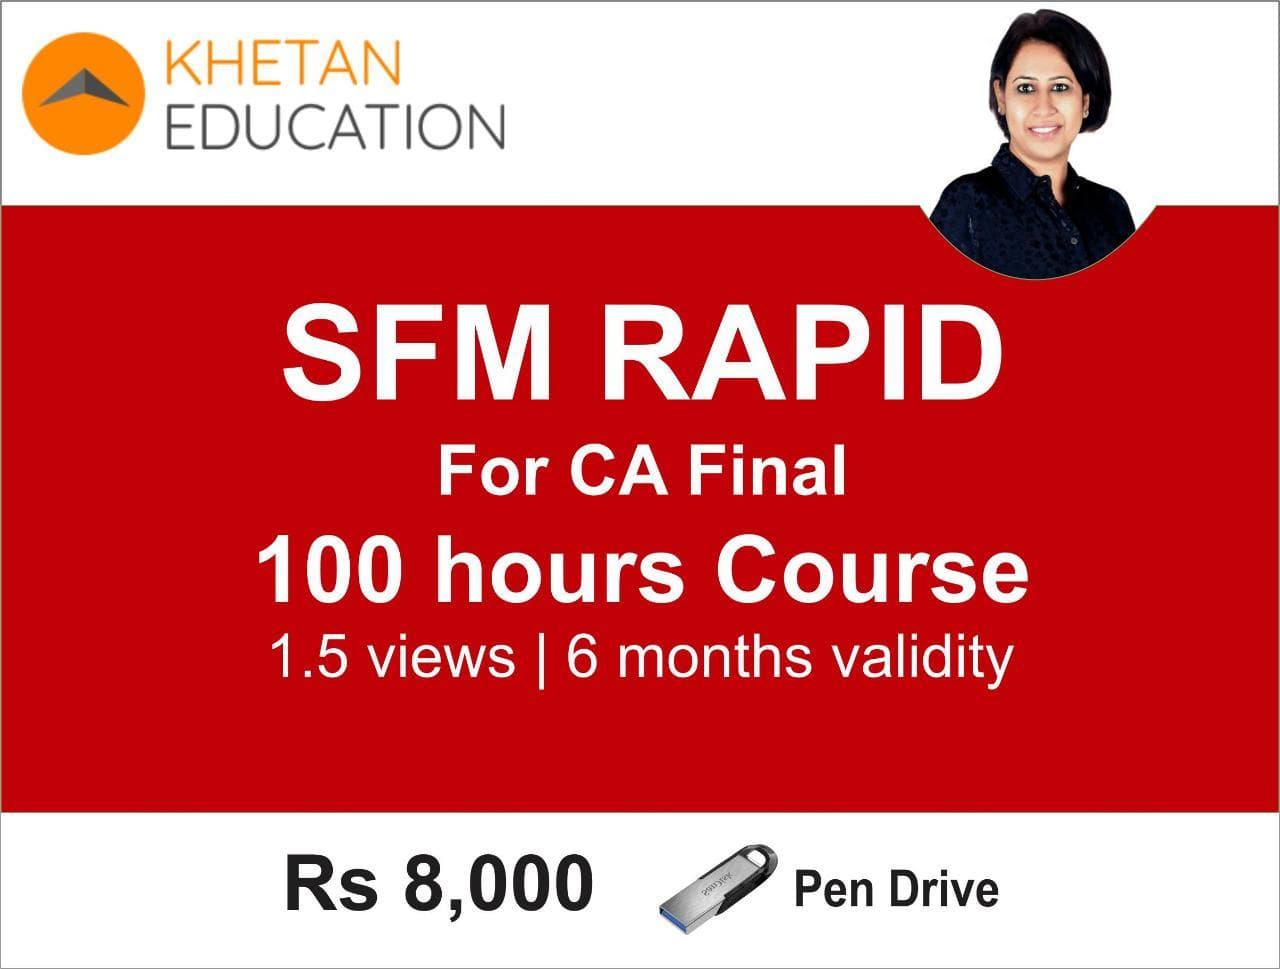 sfm-rapid-pen-drive